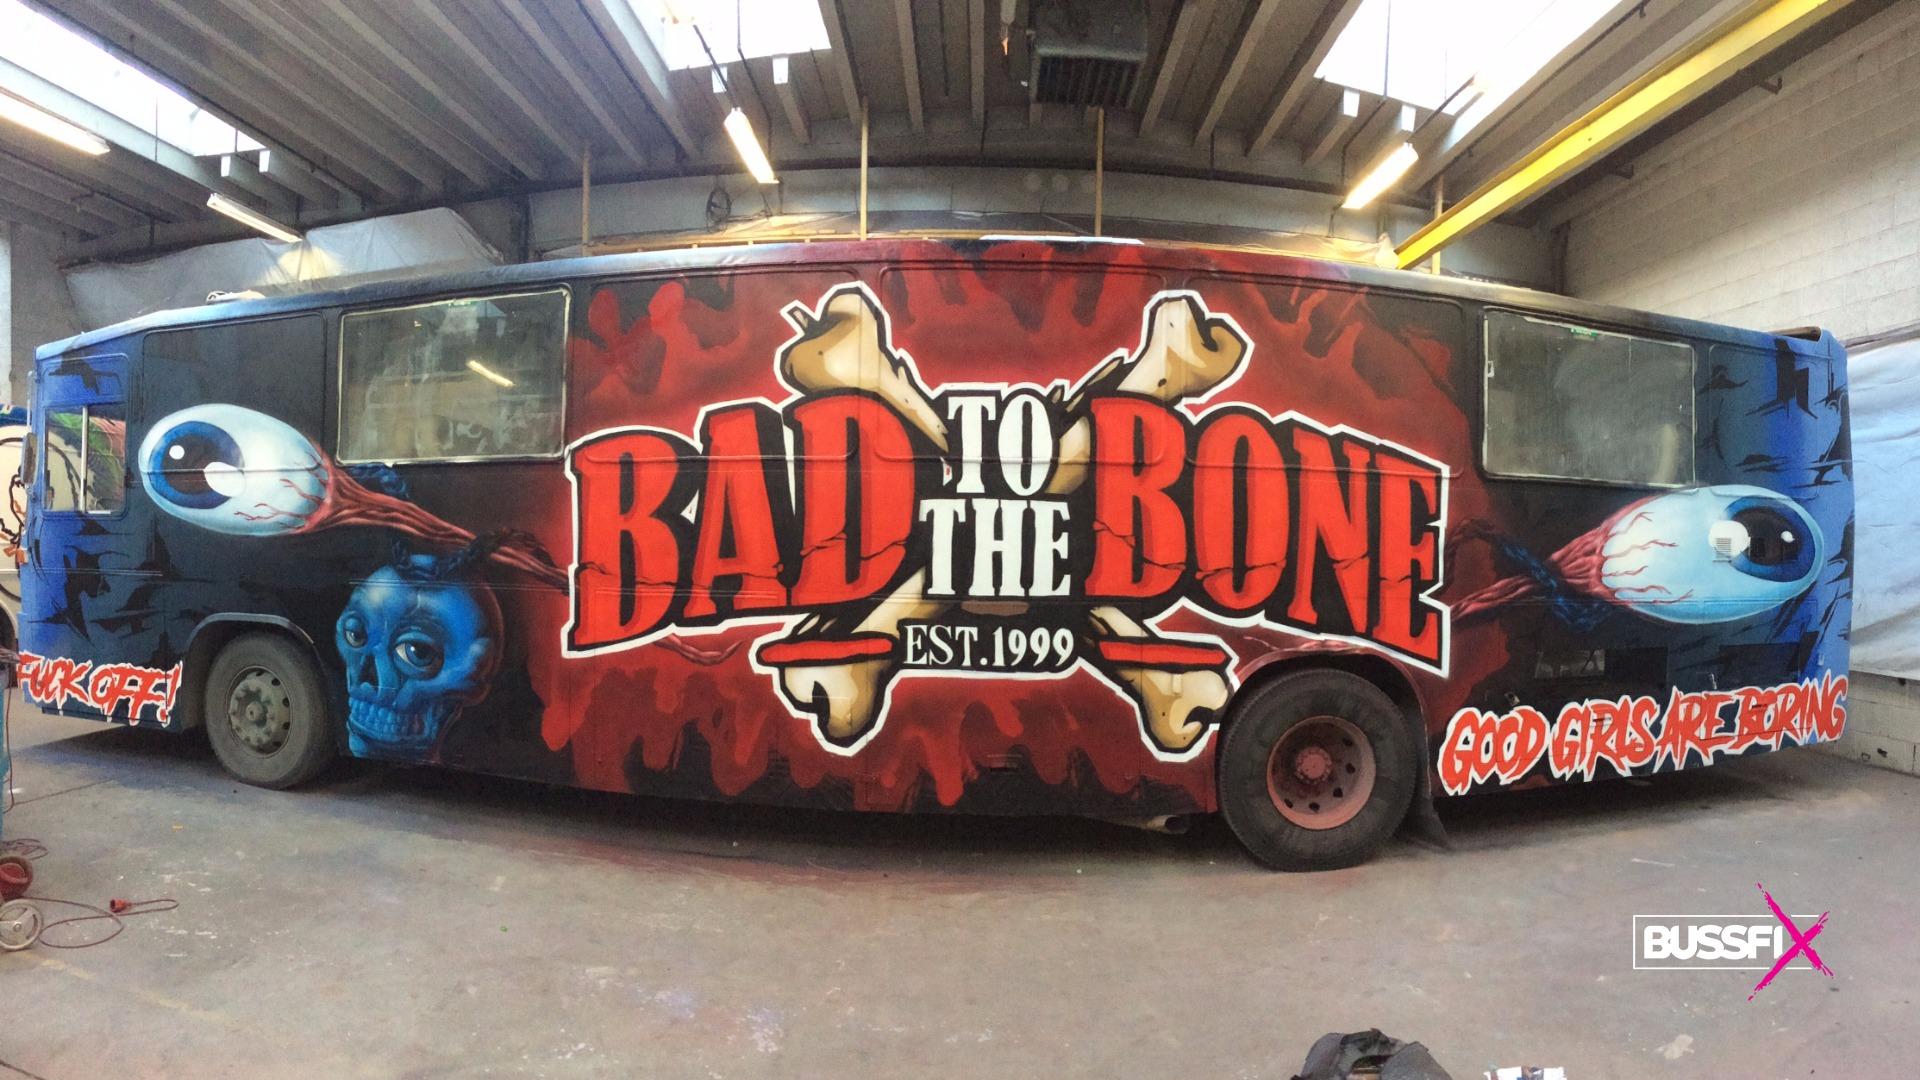 Graffiti russebuss bad to the bone 2018